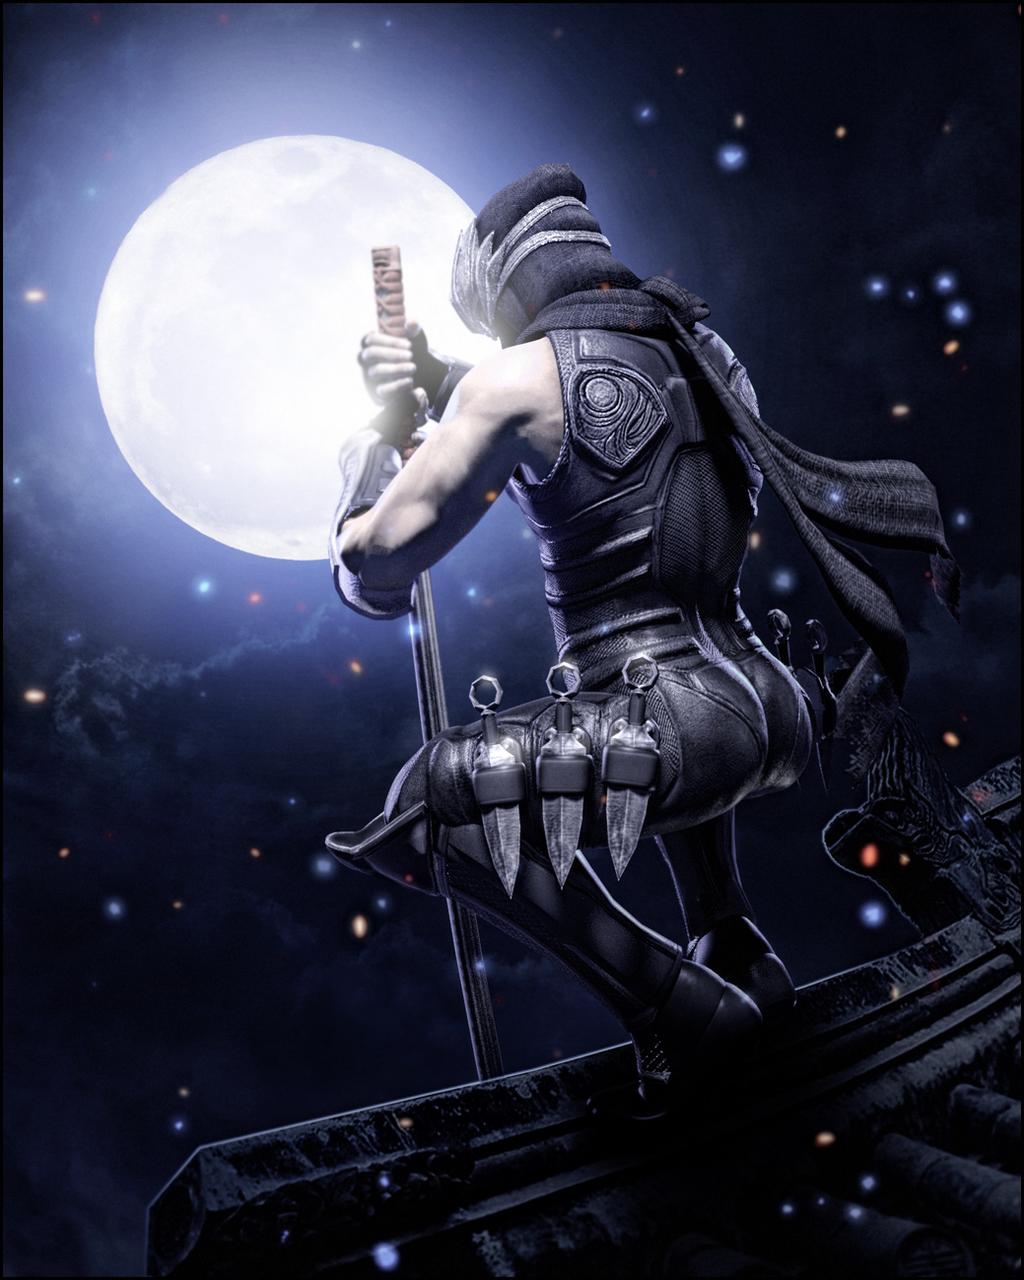 Ryu Hayabusa by FearEffectInferno